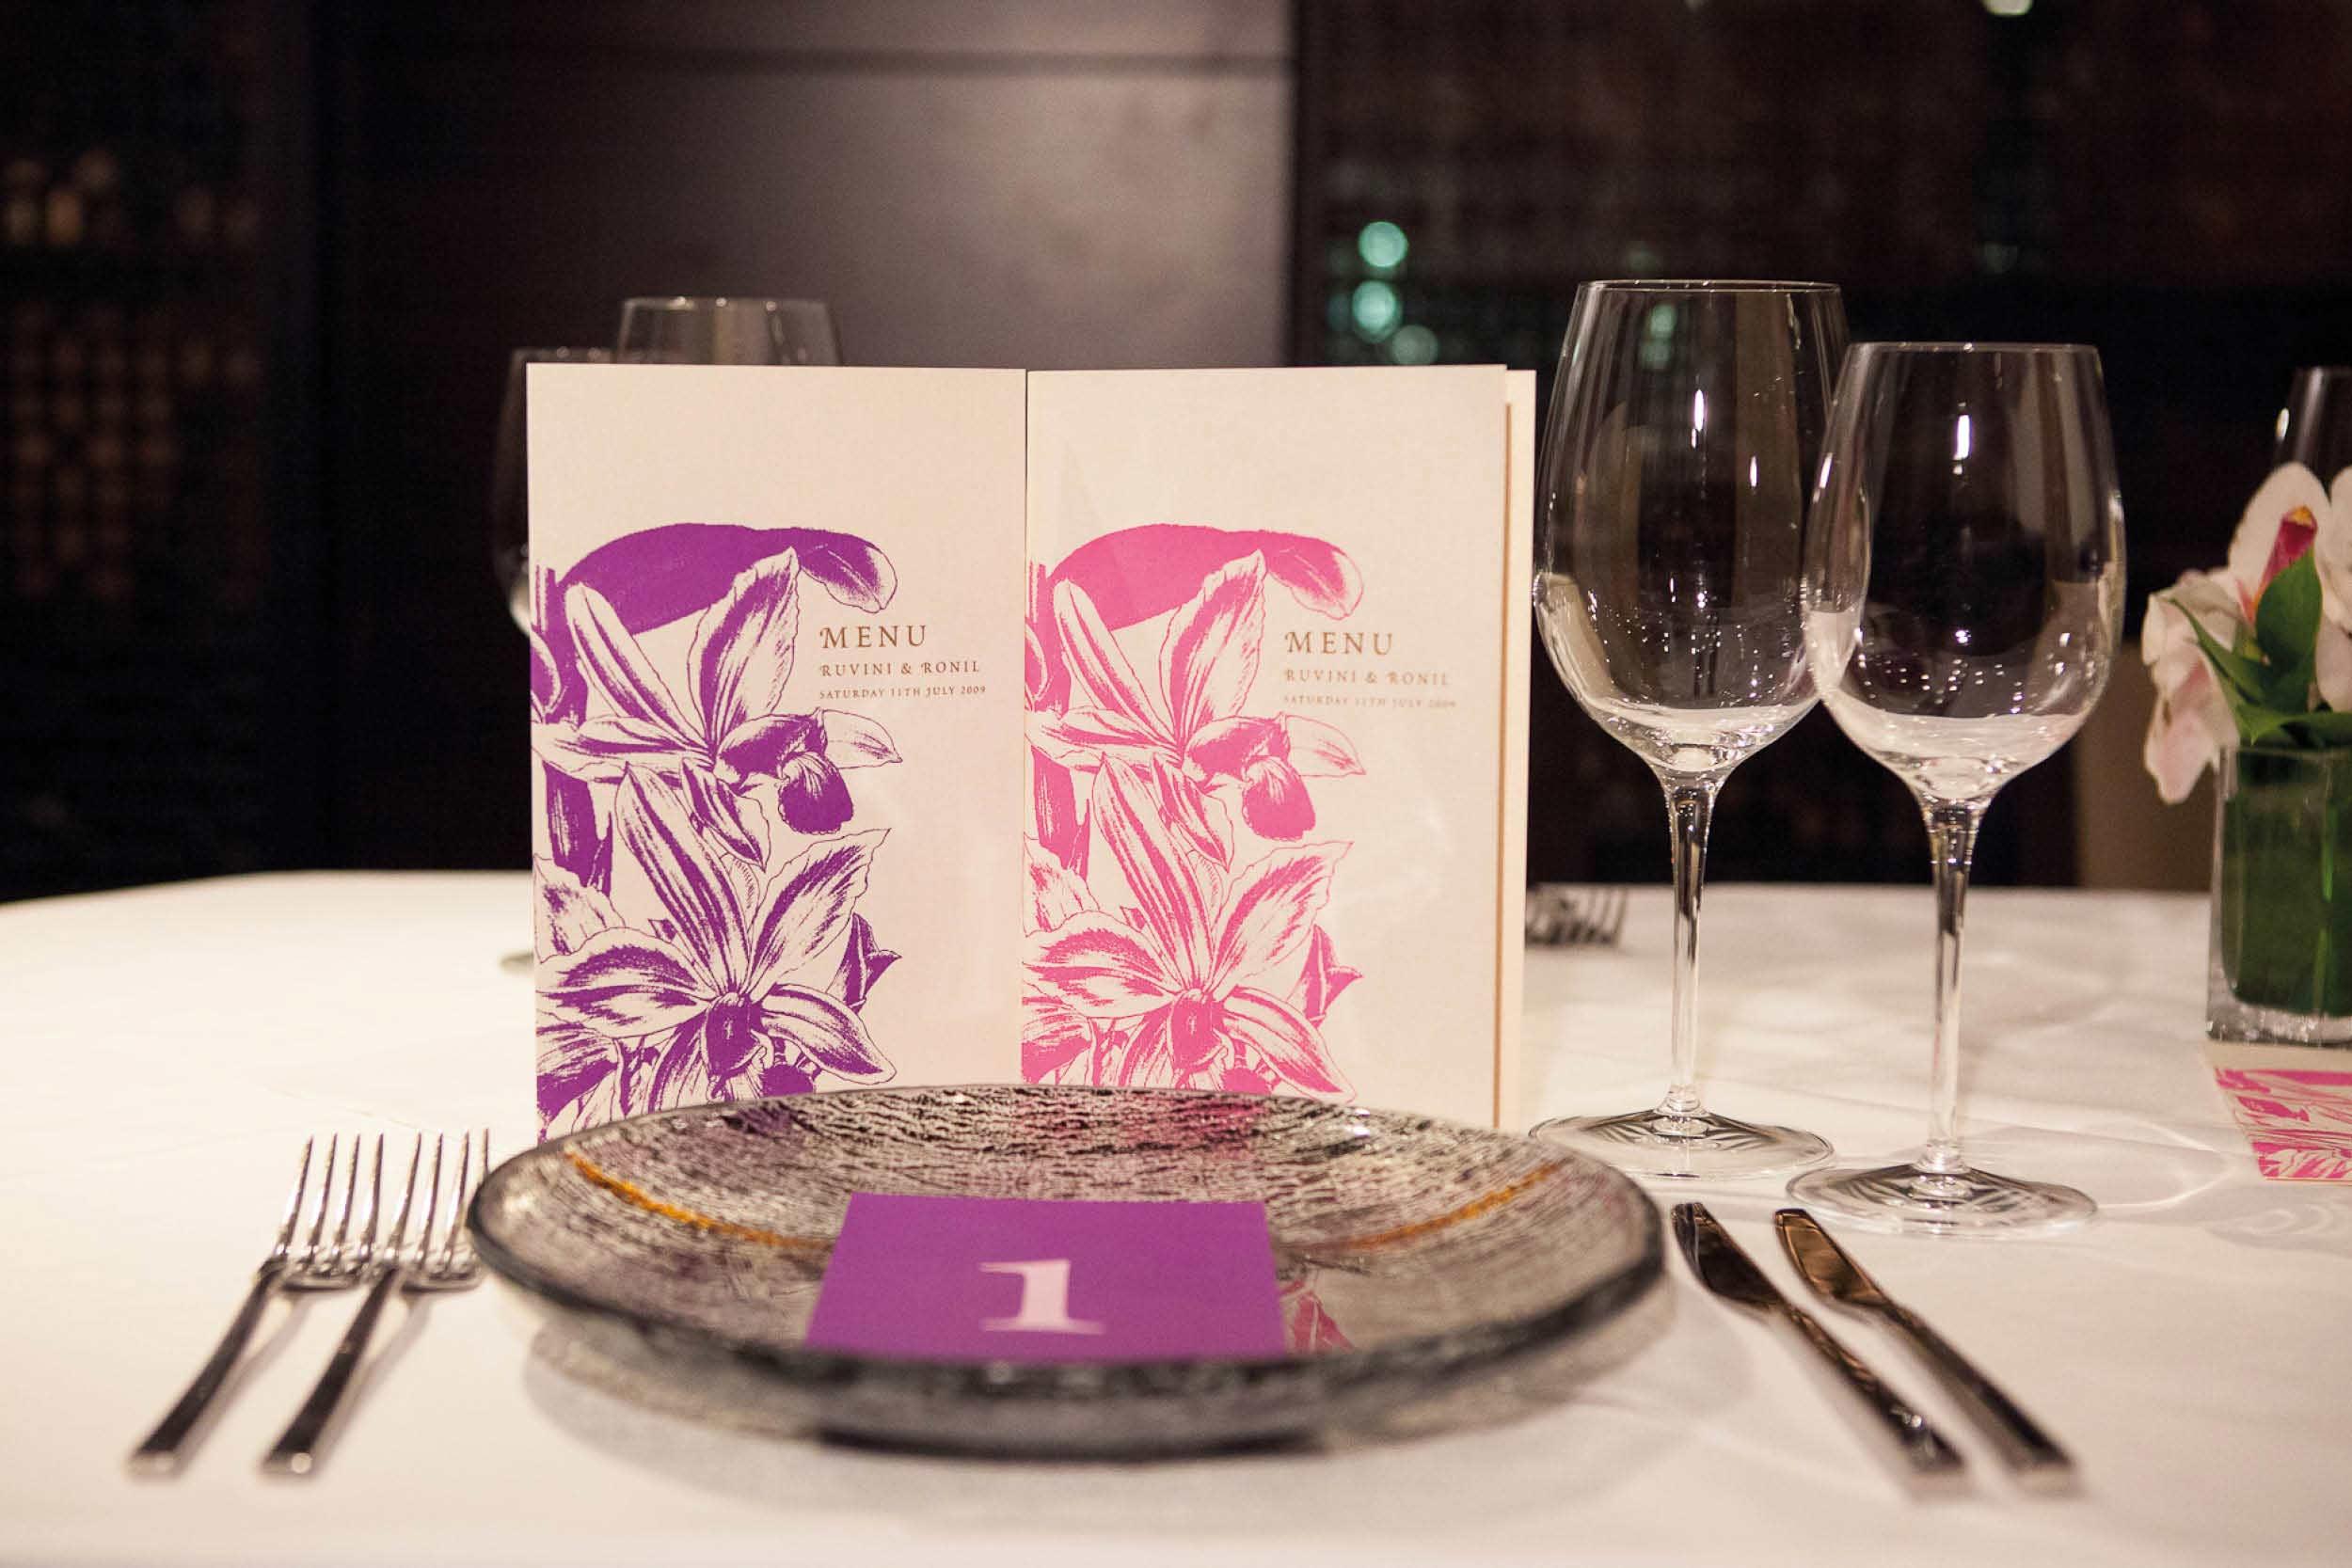 Orchid_wedding menu table setting_bespoke_ananyacards.com.jpg